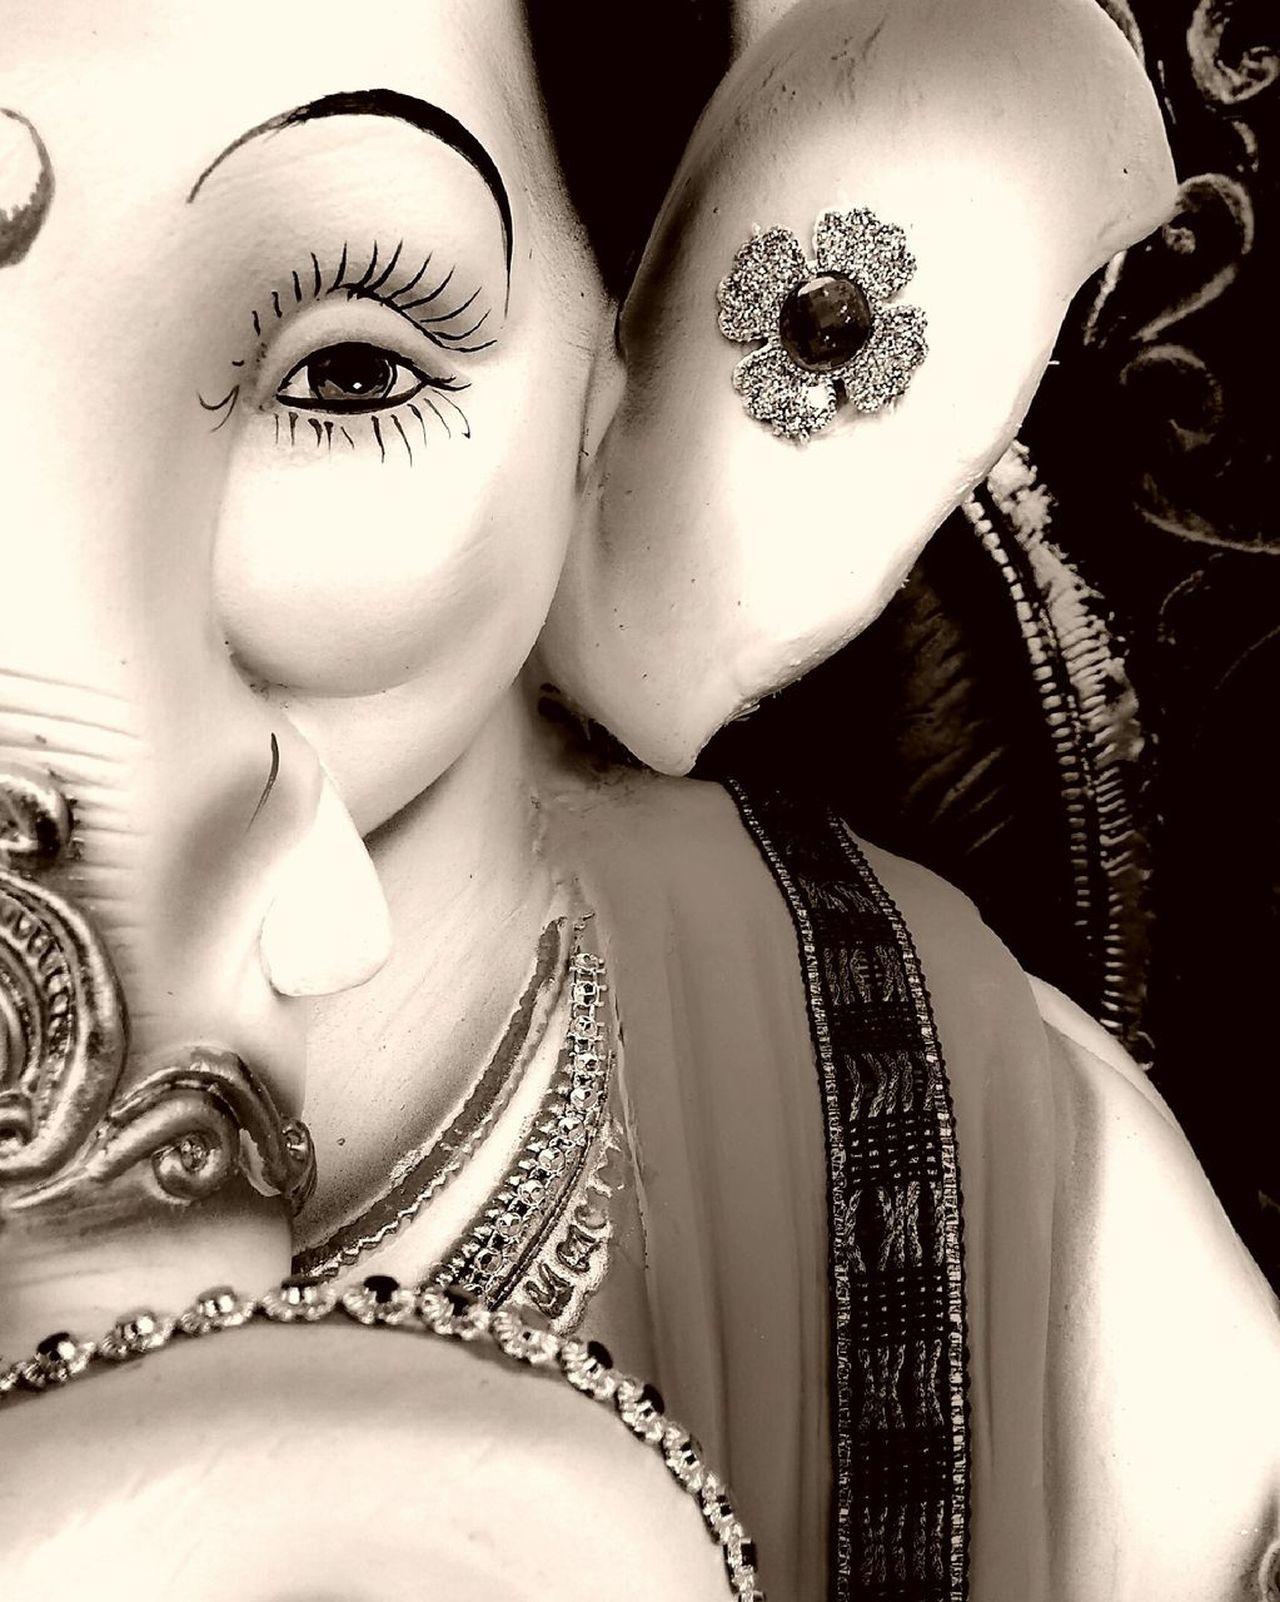 Close-up Indoors  Eyelash Day God God's Beauty Ganapati Ganapati Bappa Morya....! Ganapatibappamorya Ganapathy Ganapathibappamoreya GanapatiBappa LoveGod Faith Ganapathi-bhappa-mouriya Ganpati Festival Ganaptibappamorya Ganapati Bappa Mooraya GanapatiBappaMoriya EmNewHere Sculpture Blqckandwhite